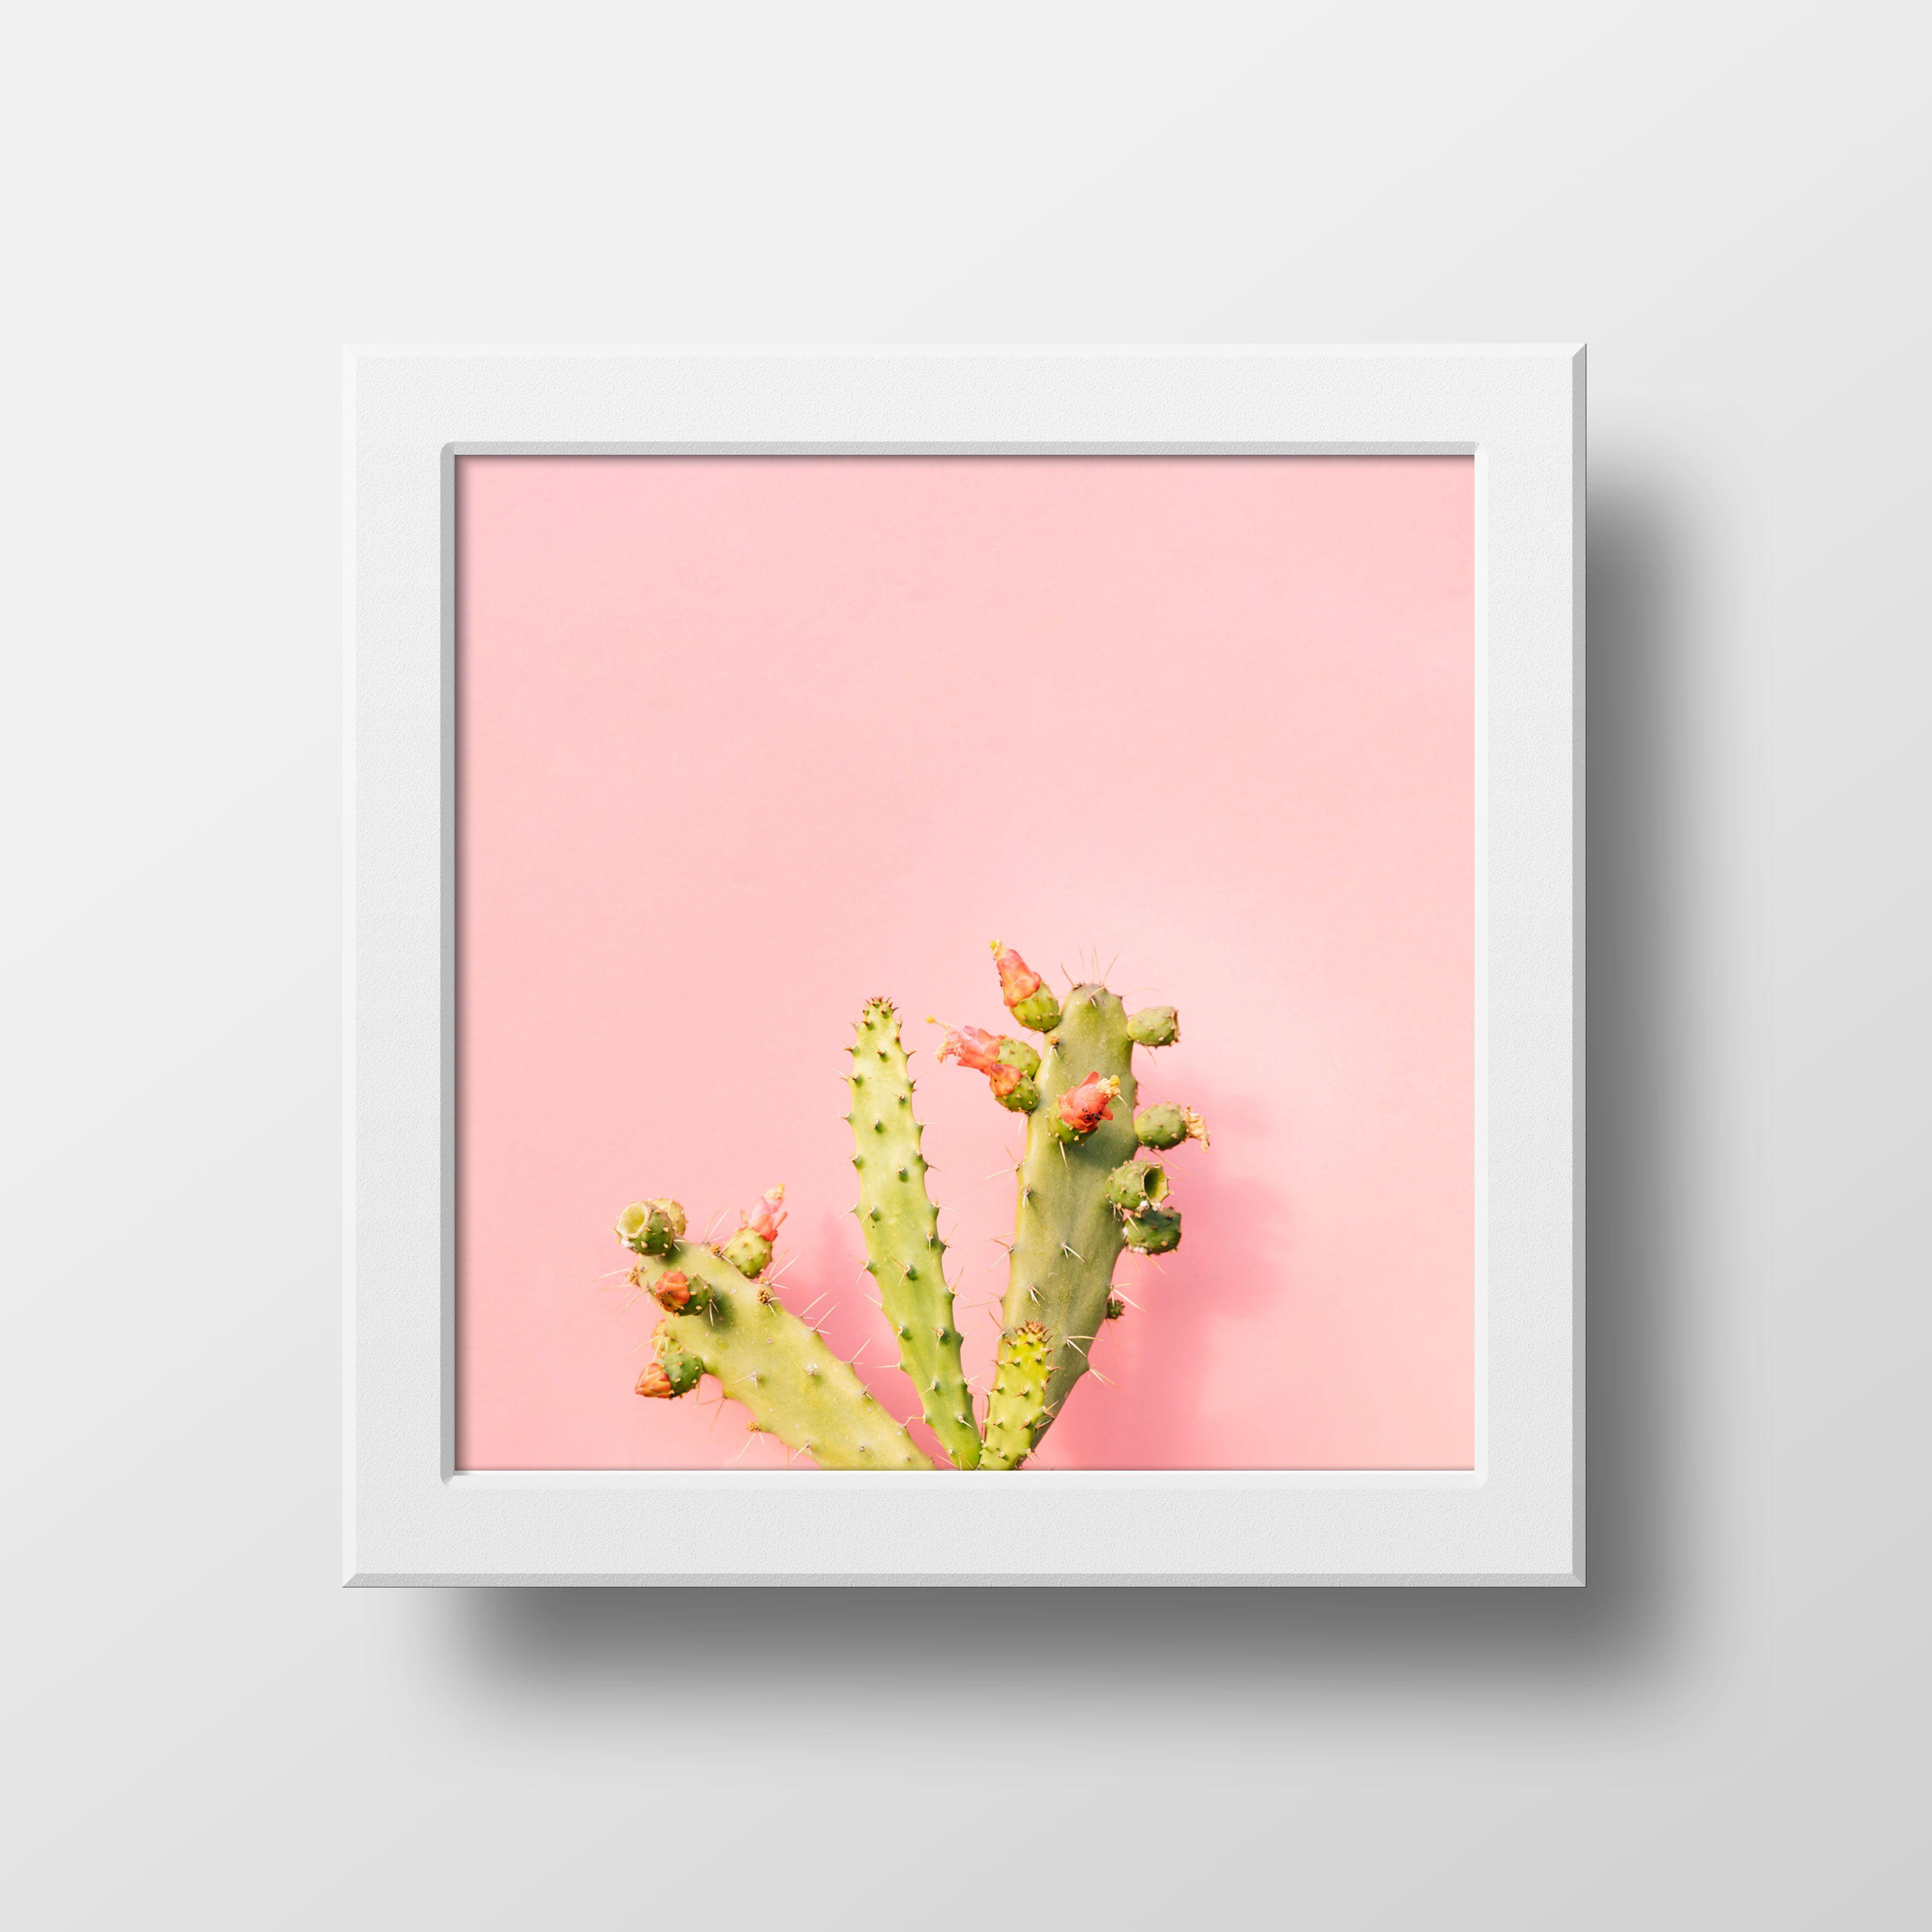 081 946 542 871 Wall Decor Kaktus Hiasan Dinding Kaktus Hiasan Dinding Poster Kaktus Poster Menggambar Kaktus Hitam Dan Putih